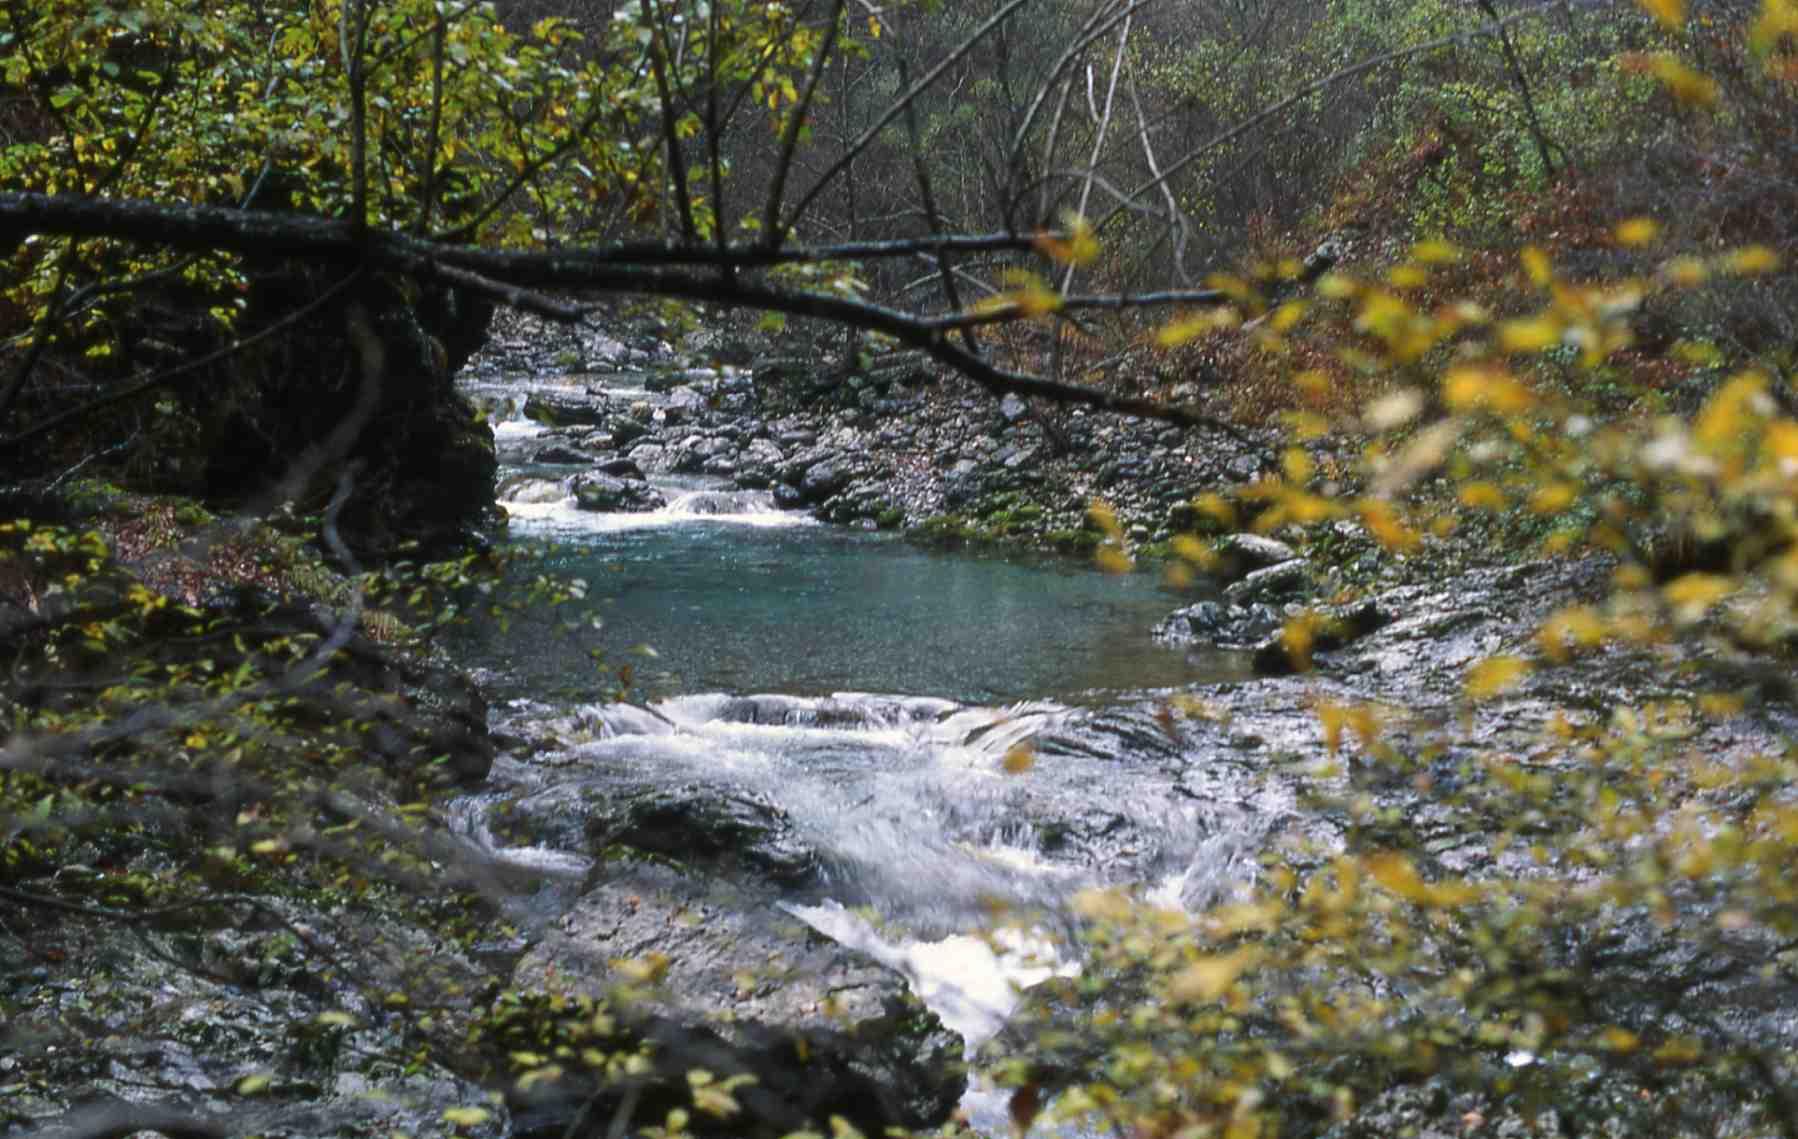 zadlascica-slovenia-november-1993-a-j-crivelli